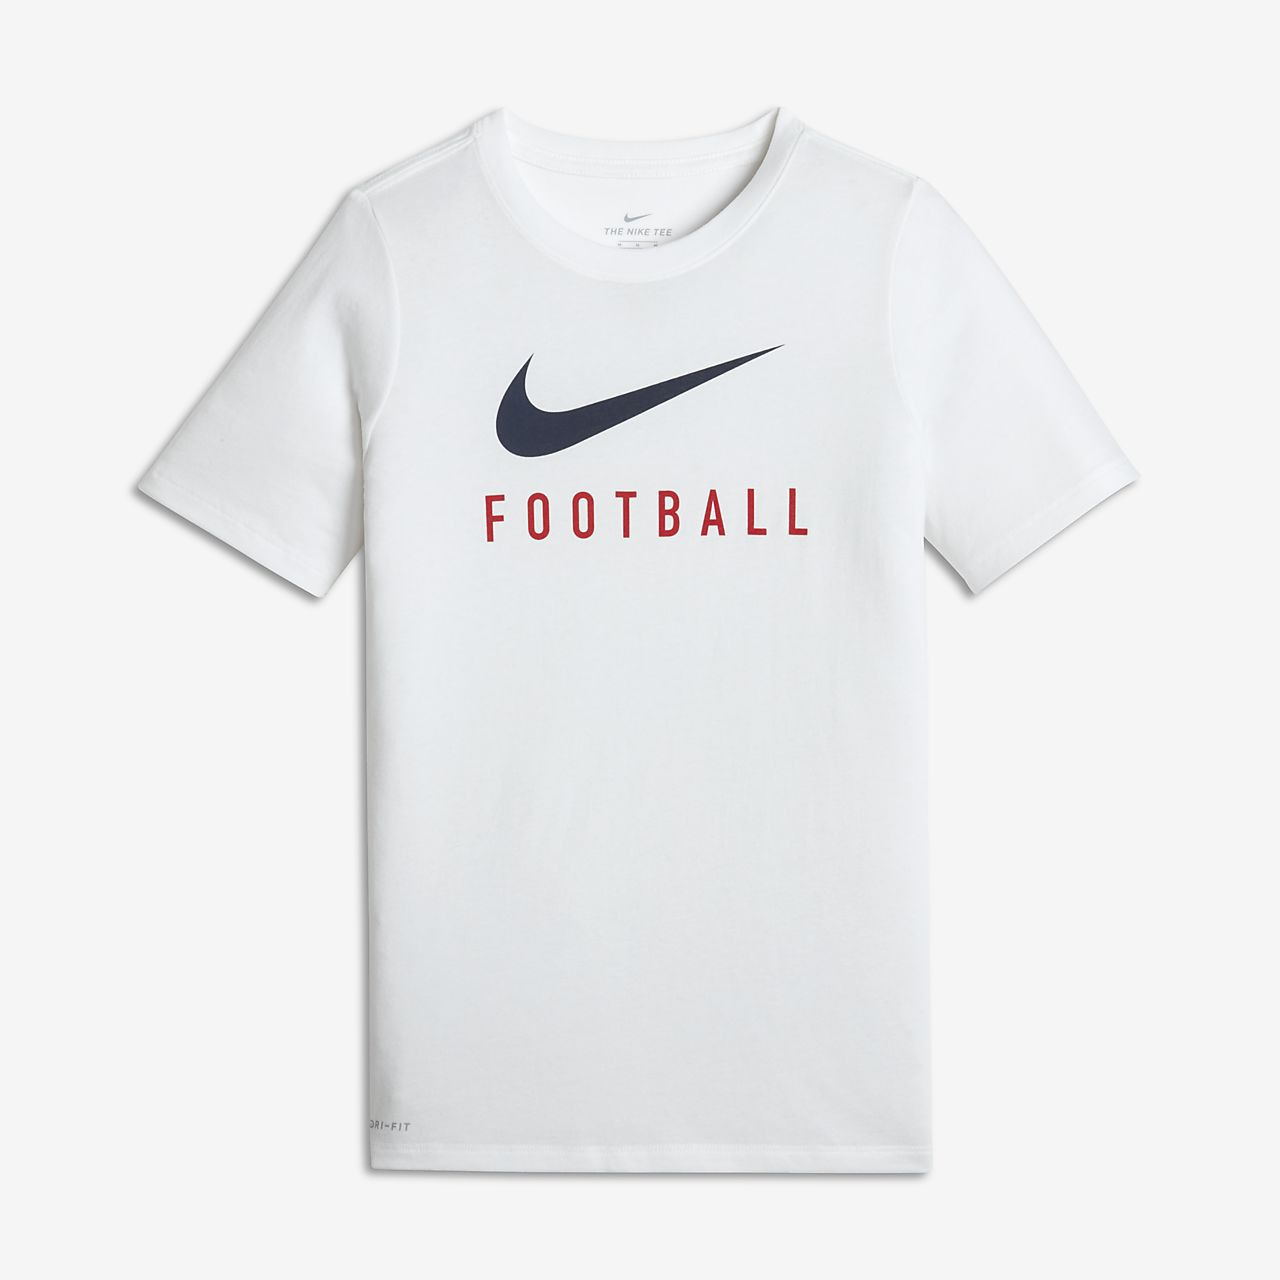 694336b9 Nike Dri-FIT Older Kids' (Boys') Football T-Shirt. Nike.com ZA